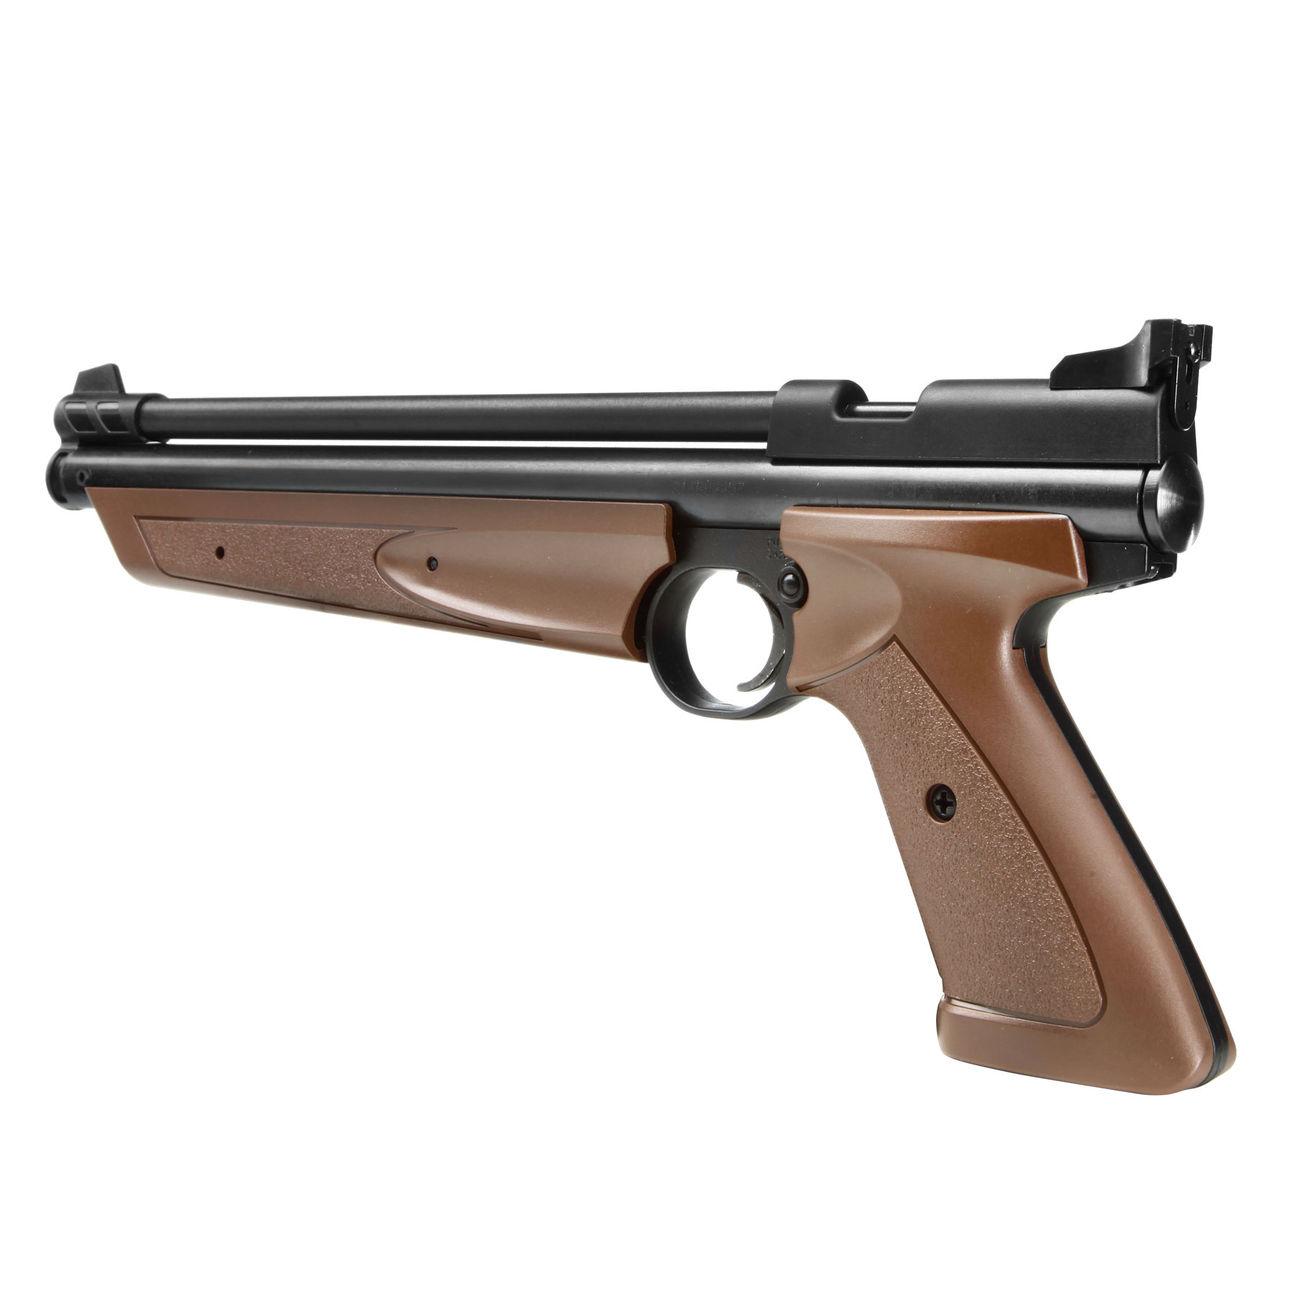 Crosman 1377 American Classic 4.5 mm Diabolo Pump-Luftpistole braun - Kotte & Zeller